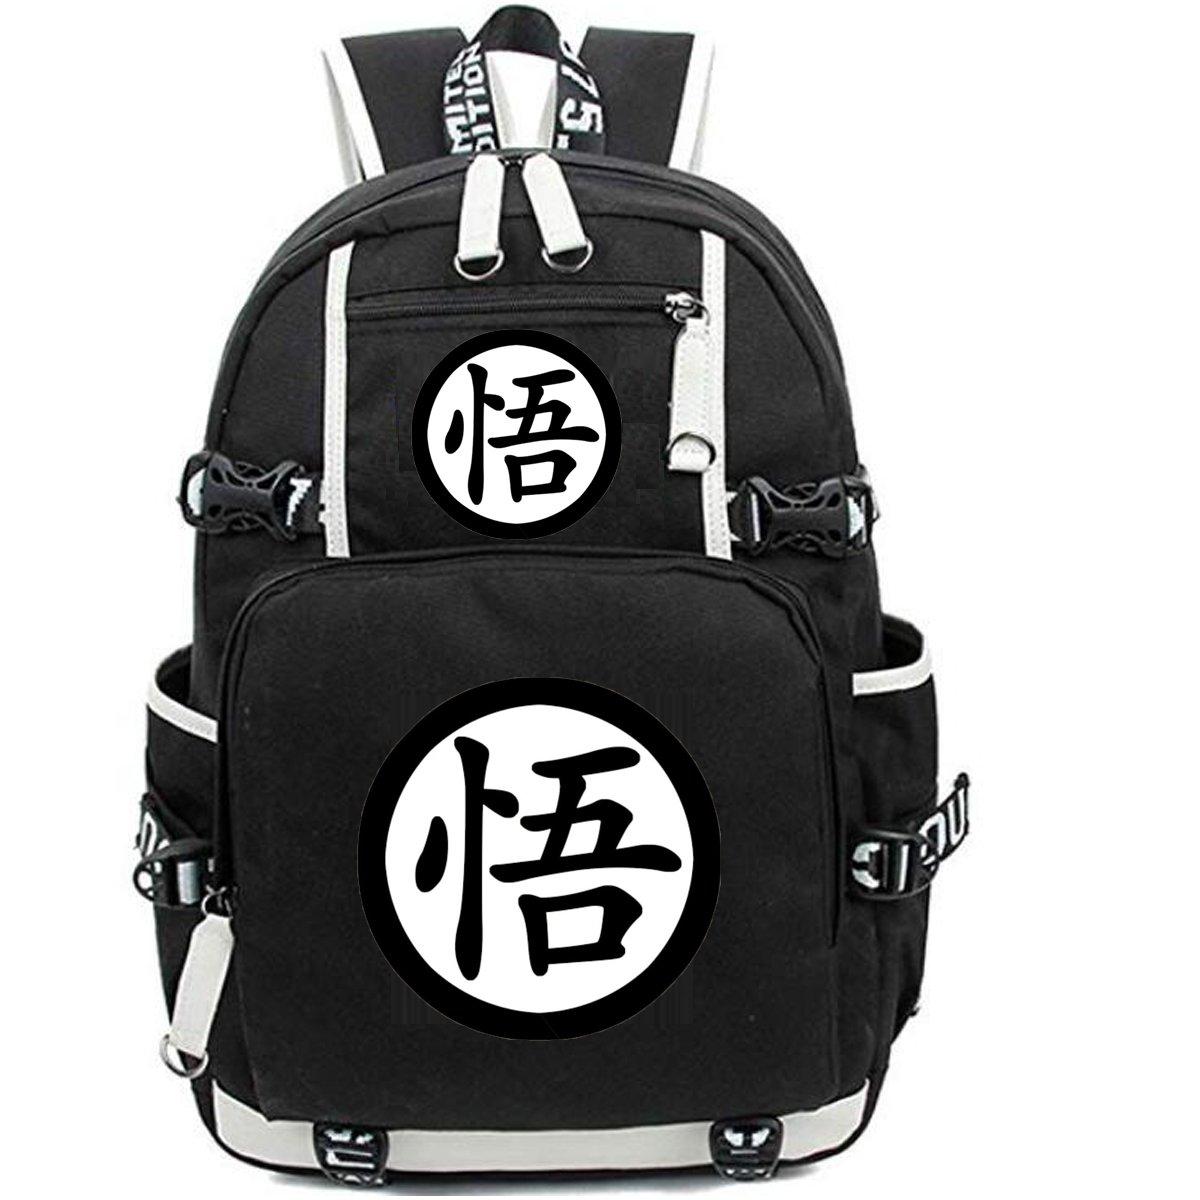 NSOKing Hot Japanese Dragon Ball Anime Cosplay Student Travel Backpack Bag (Length 13'' Height 17.3'' Width 5.9'', Black03)